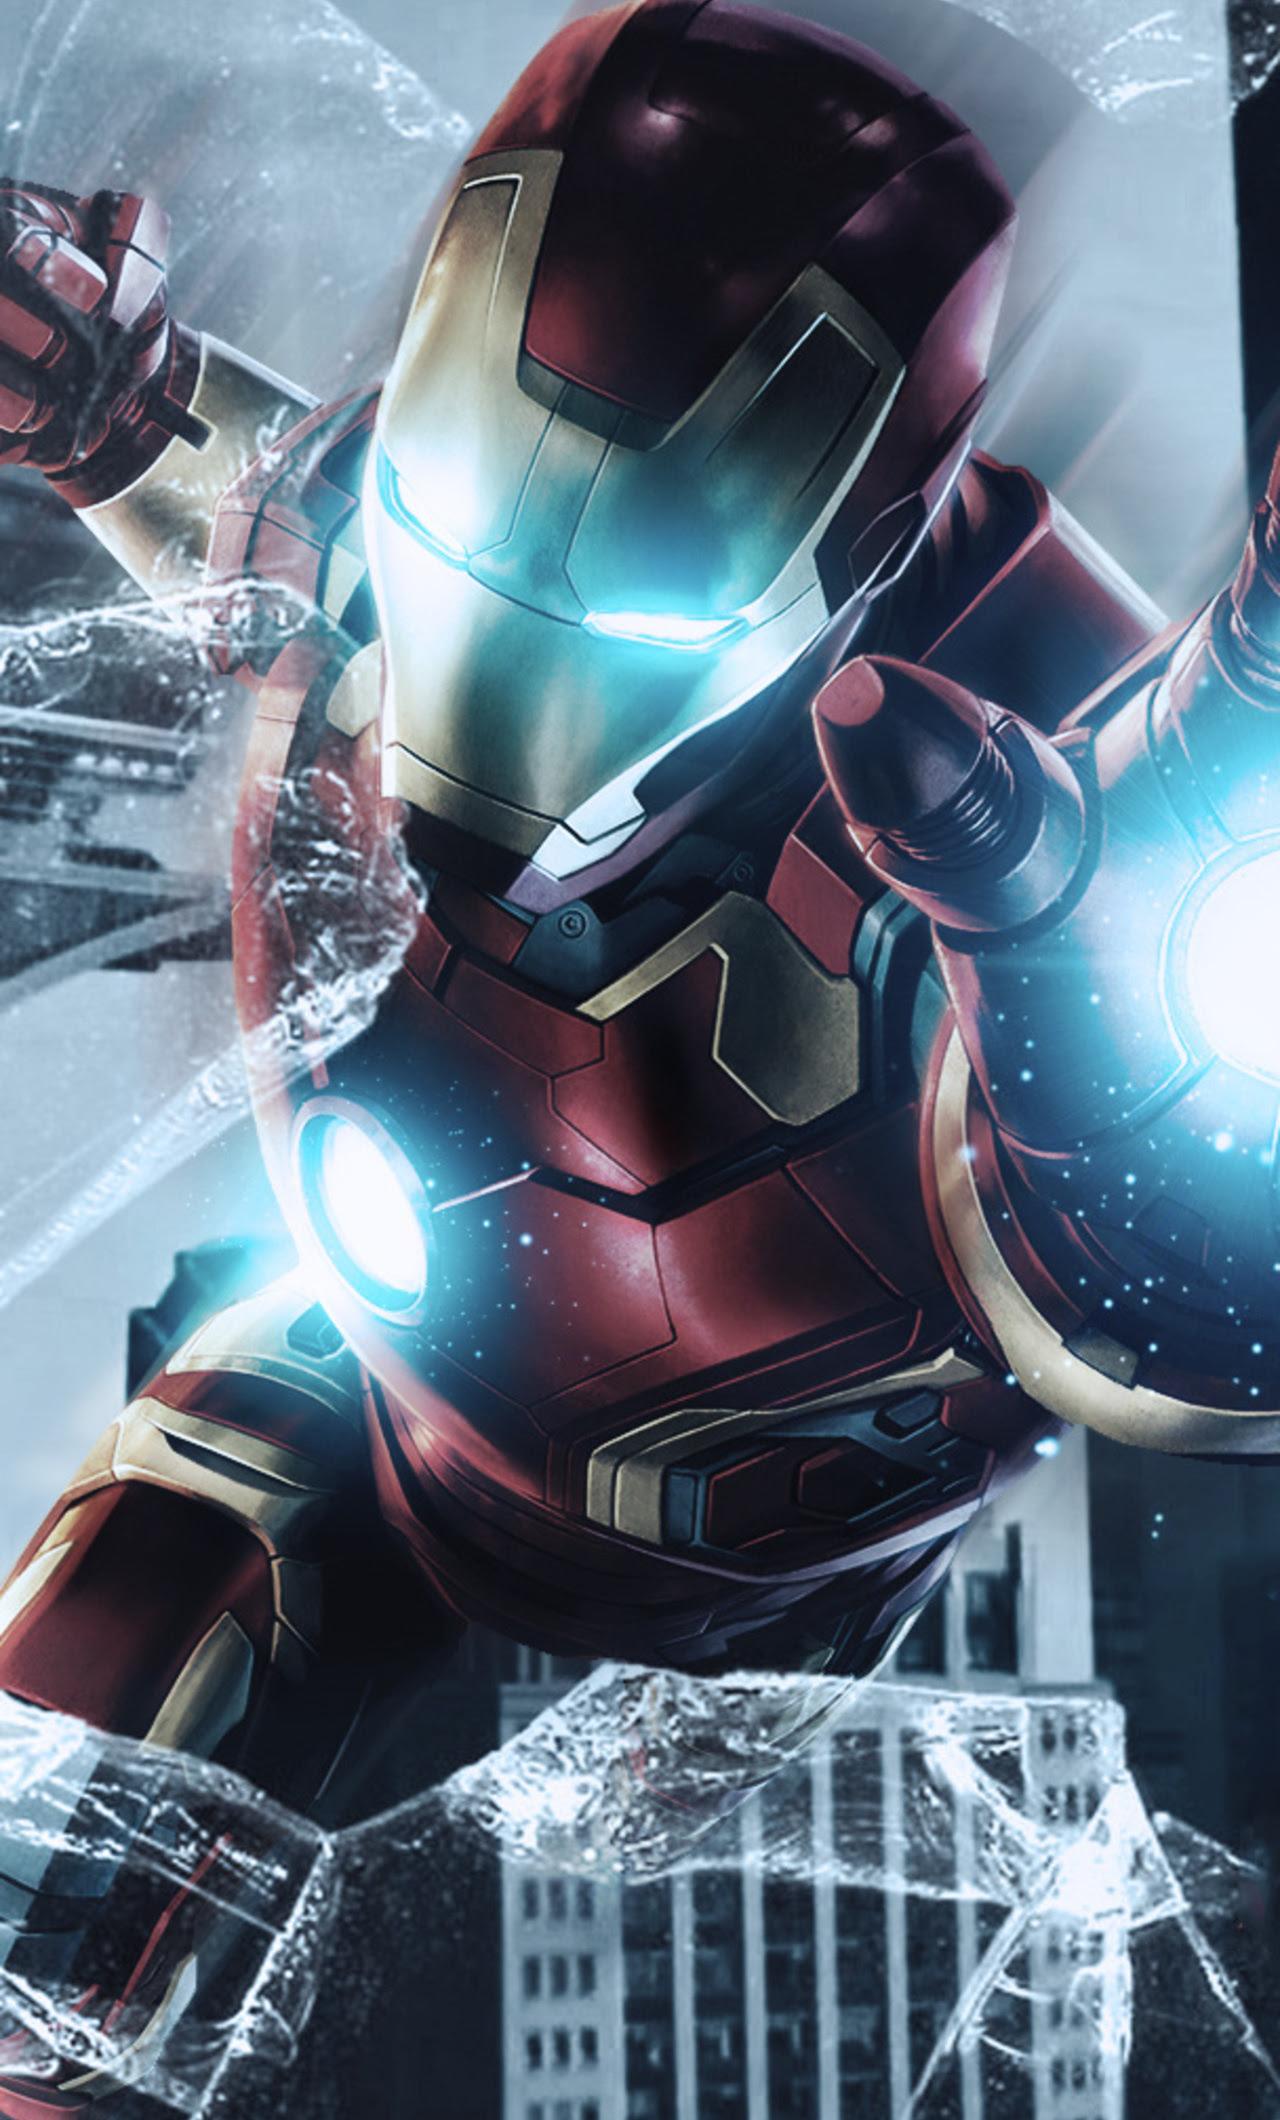 1280x2120 Iron Man Avengers Endgame Poster iPhone 6+ HD 4k ...